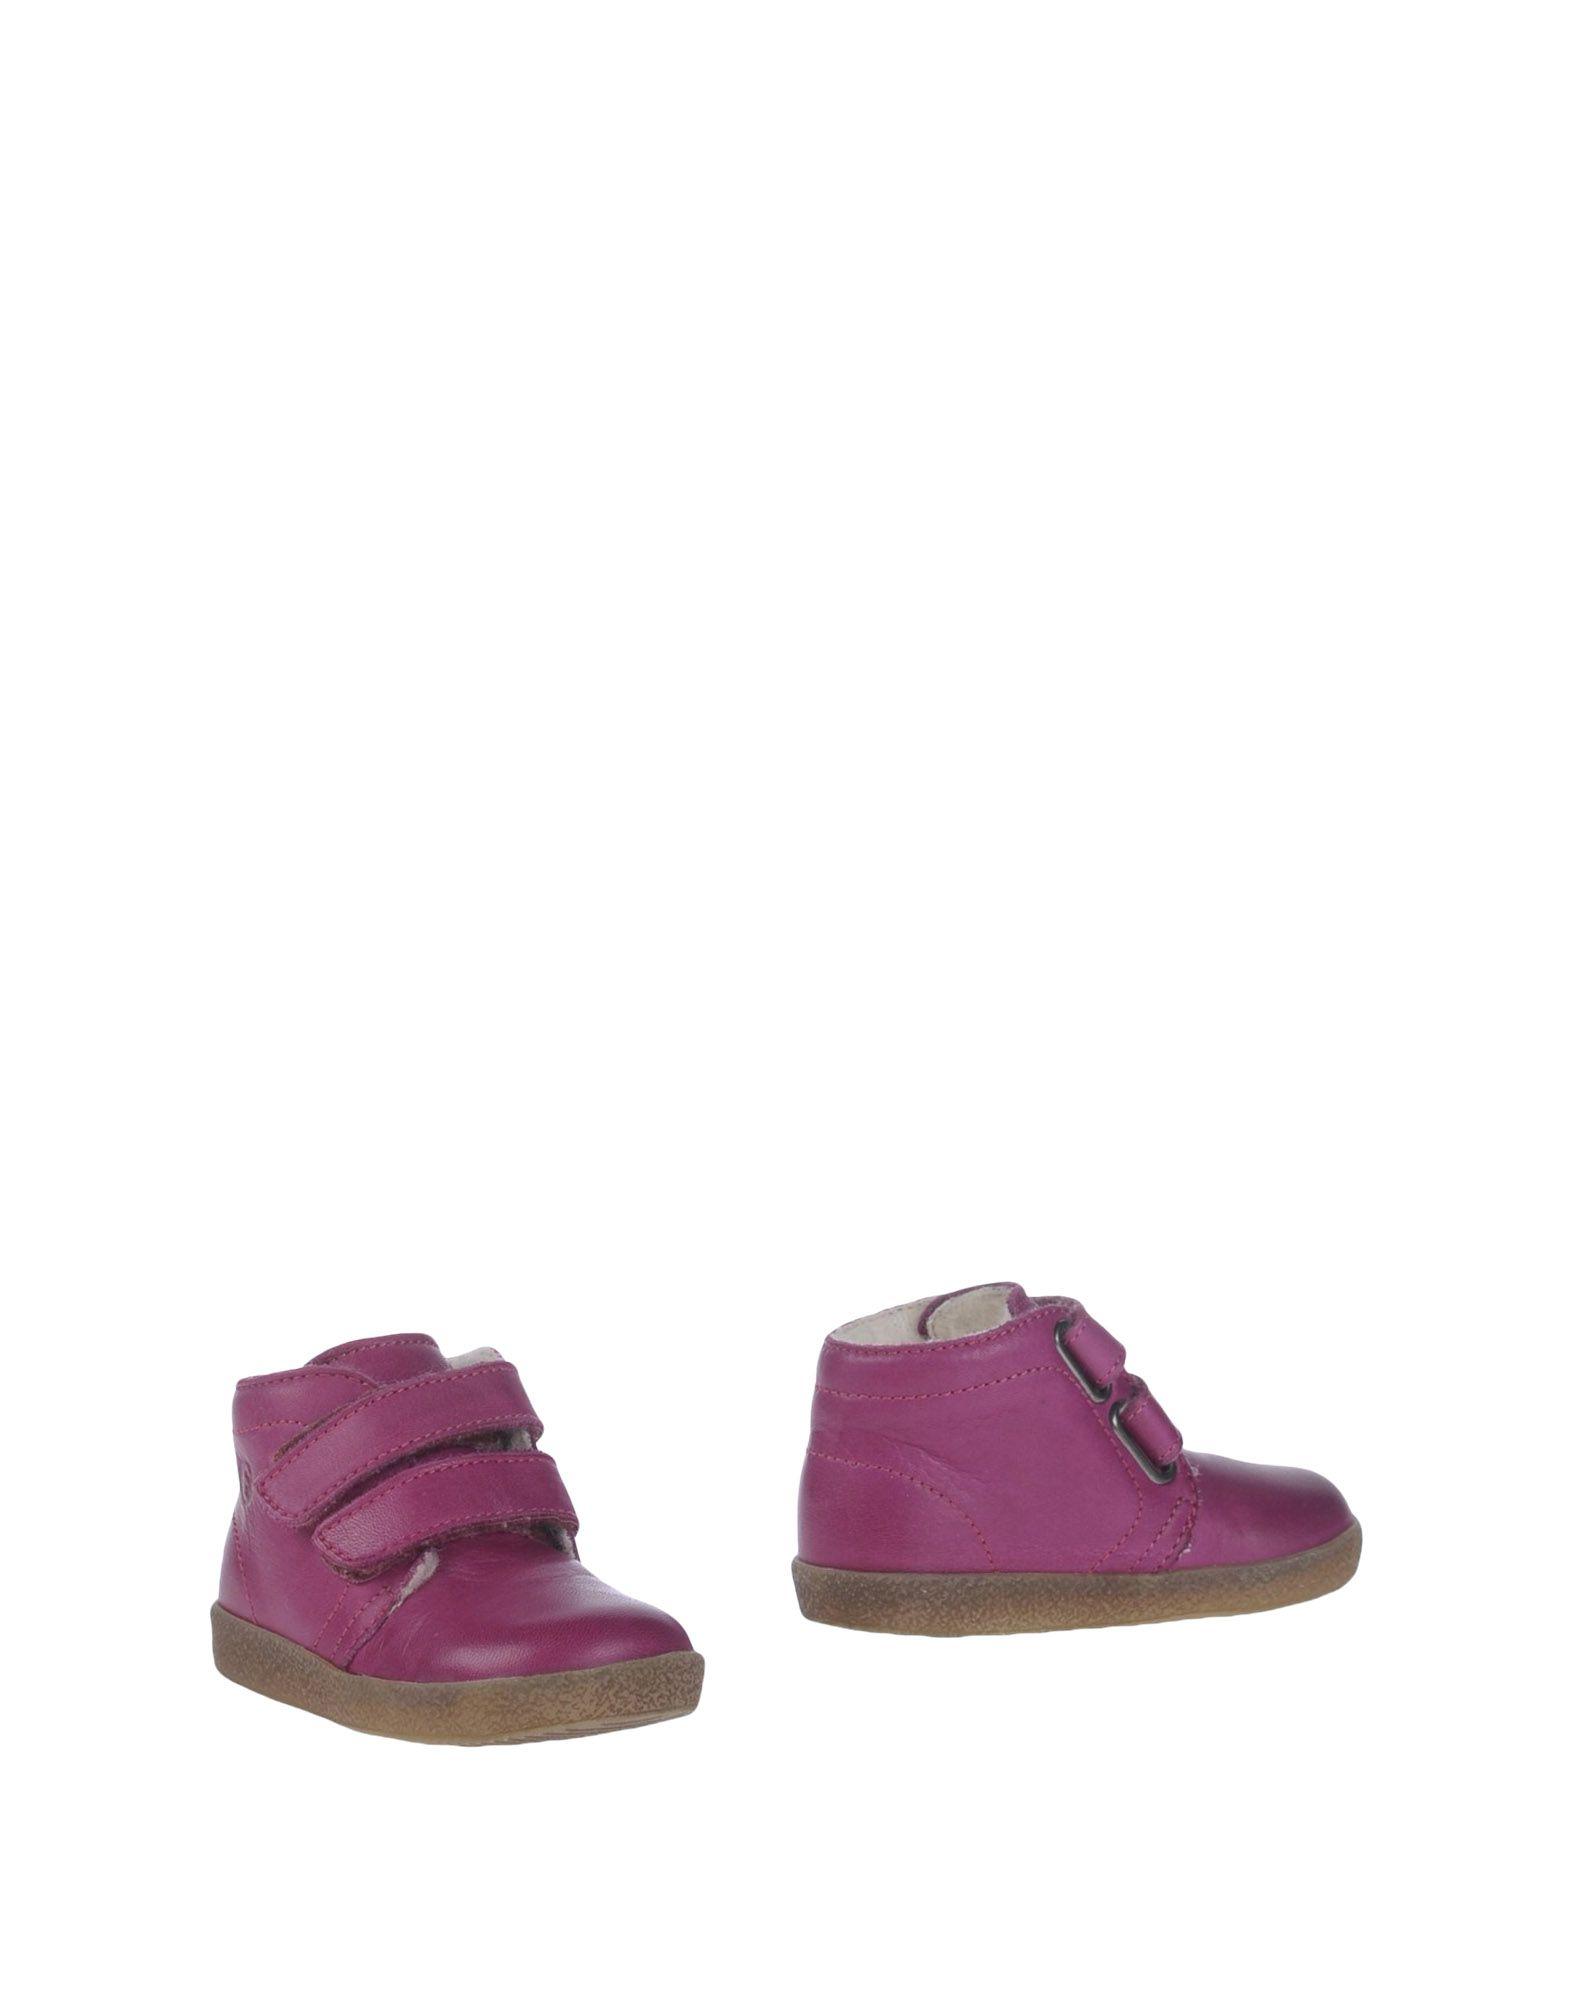 FALCOTTO Mädchen 0-24 monate Stiefelette Farbe Violett Größe 38